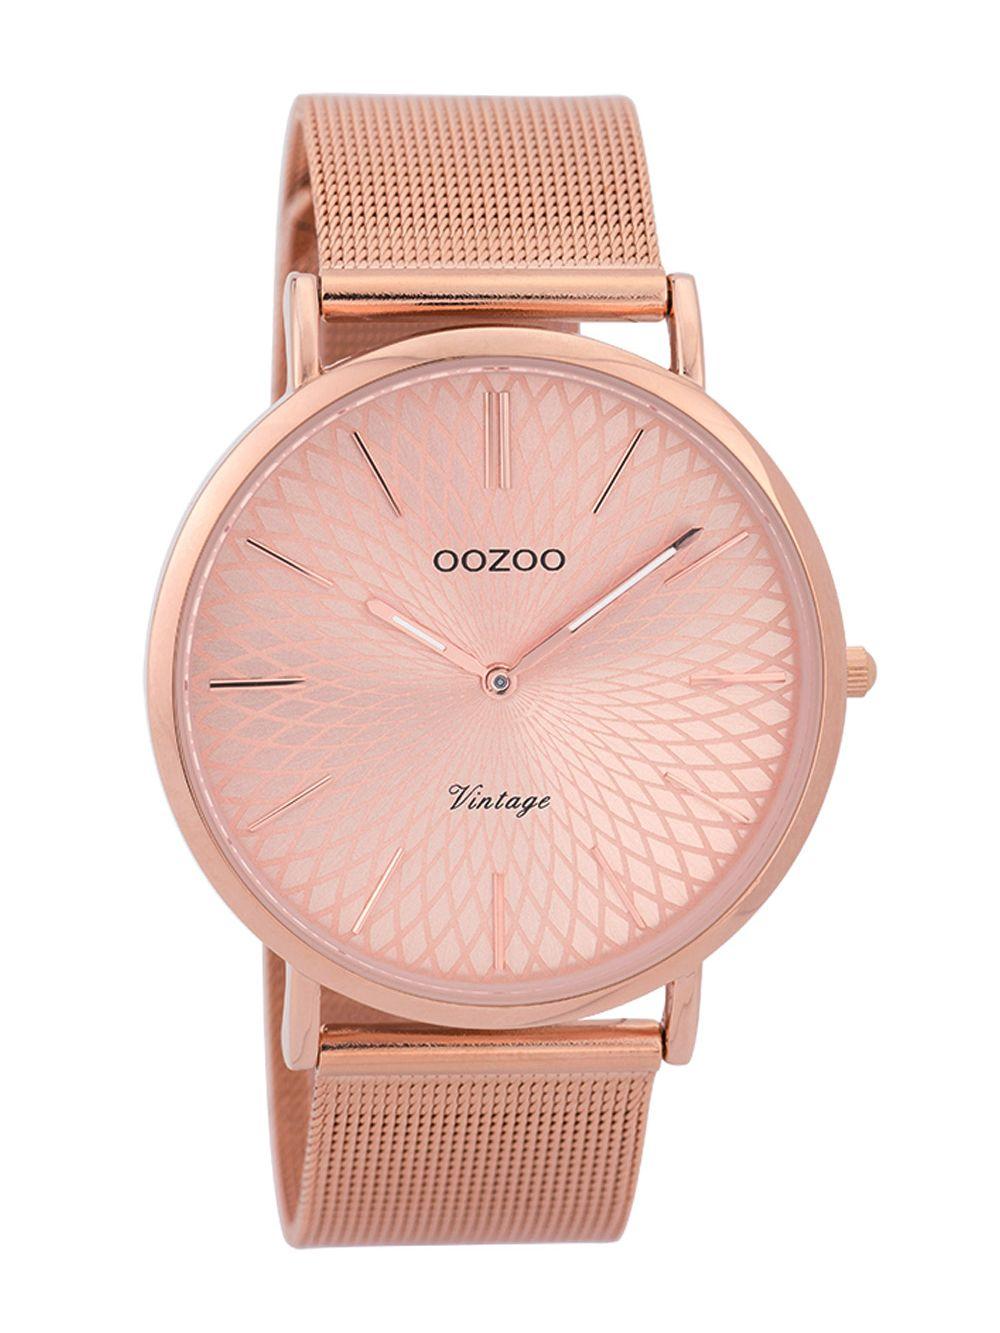 Oozoo C9343 Damen Armbanduhr Vintage Rosé 40 mm